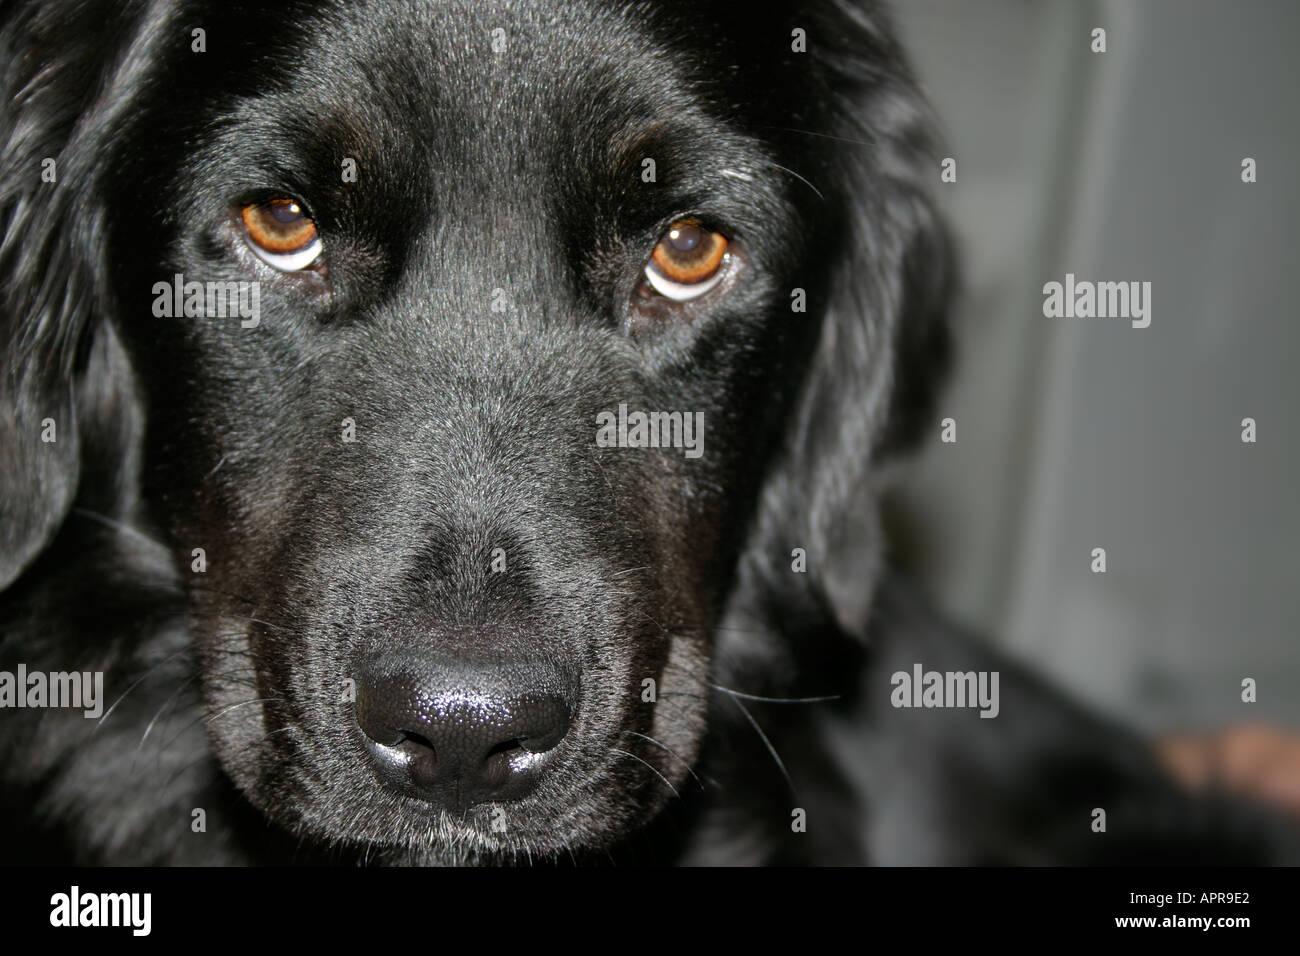 dog puppy sad puppydog canine black blackdog wet nose floppy ears